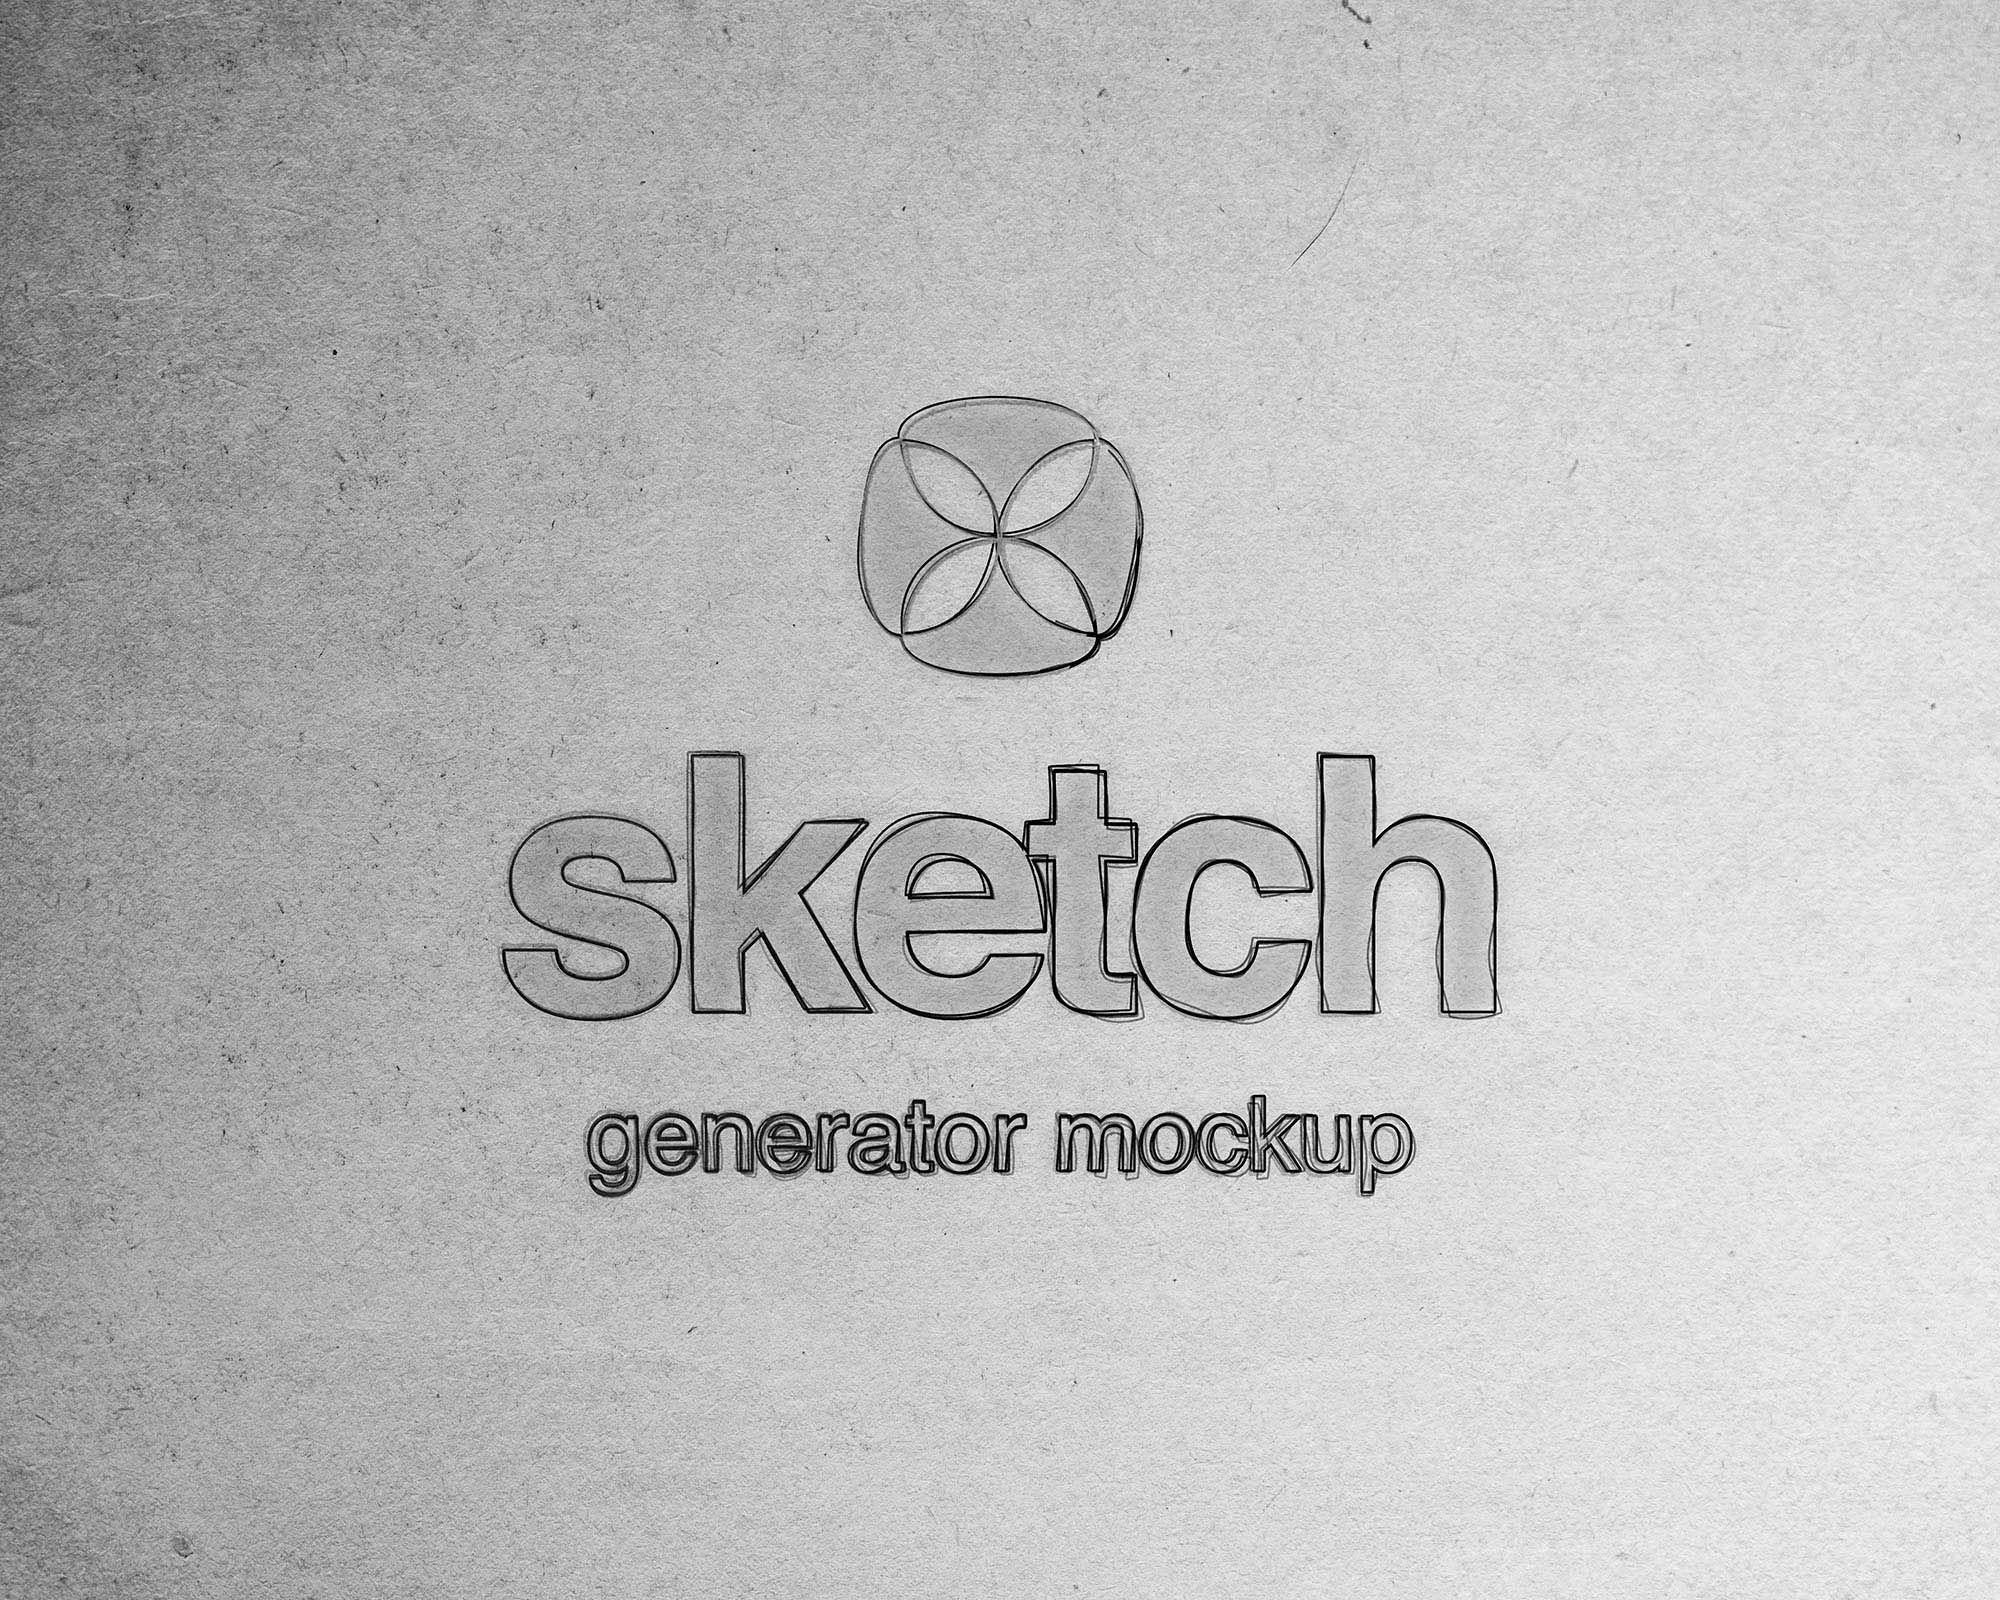 Free Sketch Generator Photoshop Mockup Psd Photoshop Mockup Photoshop Mockup